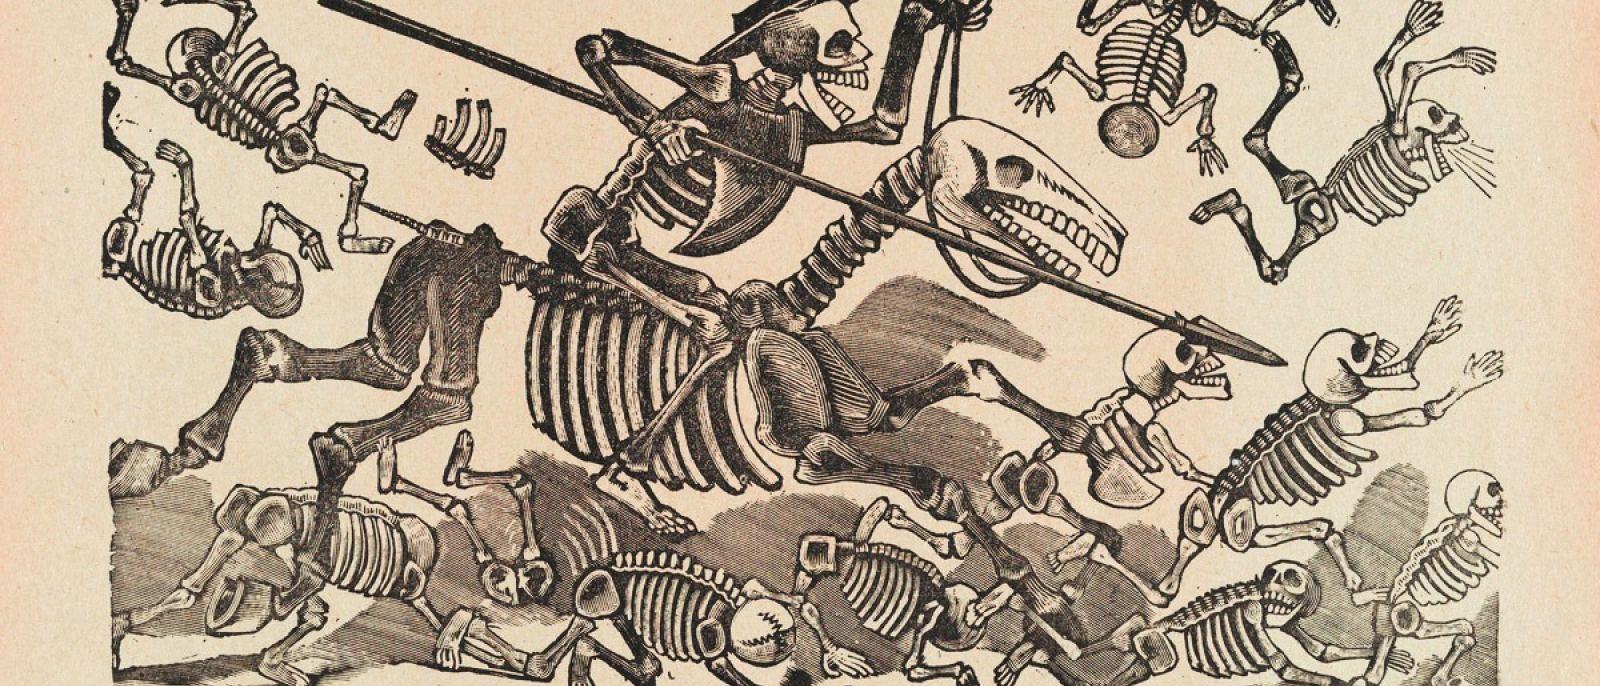 Quixote: Day of the Dead at Clifton's Republic